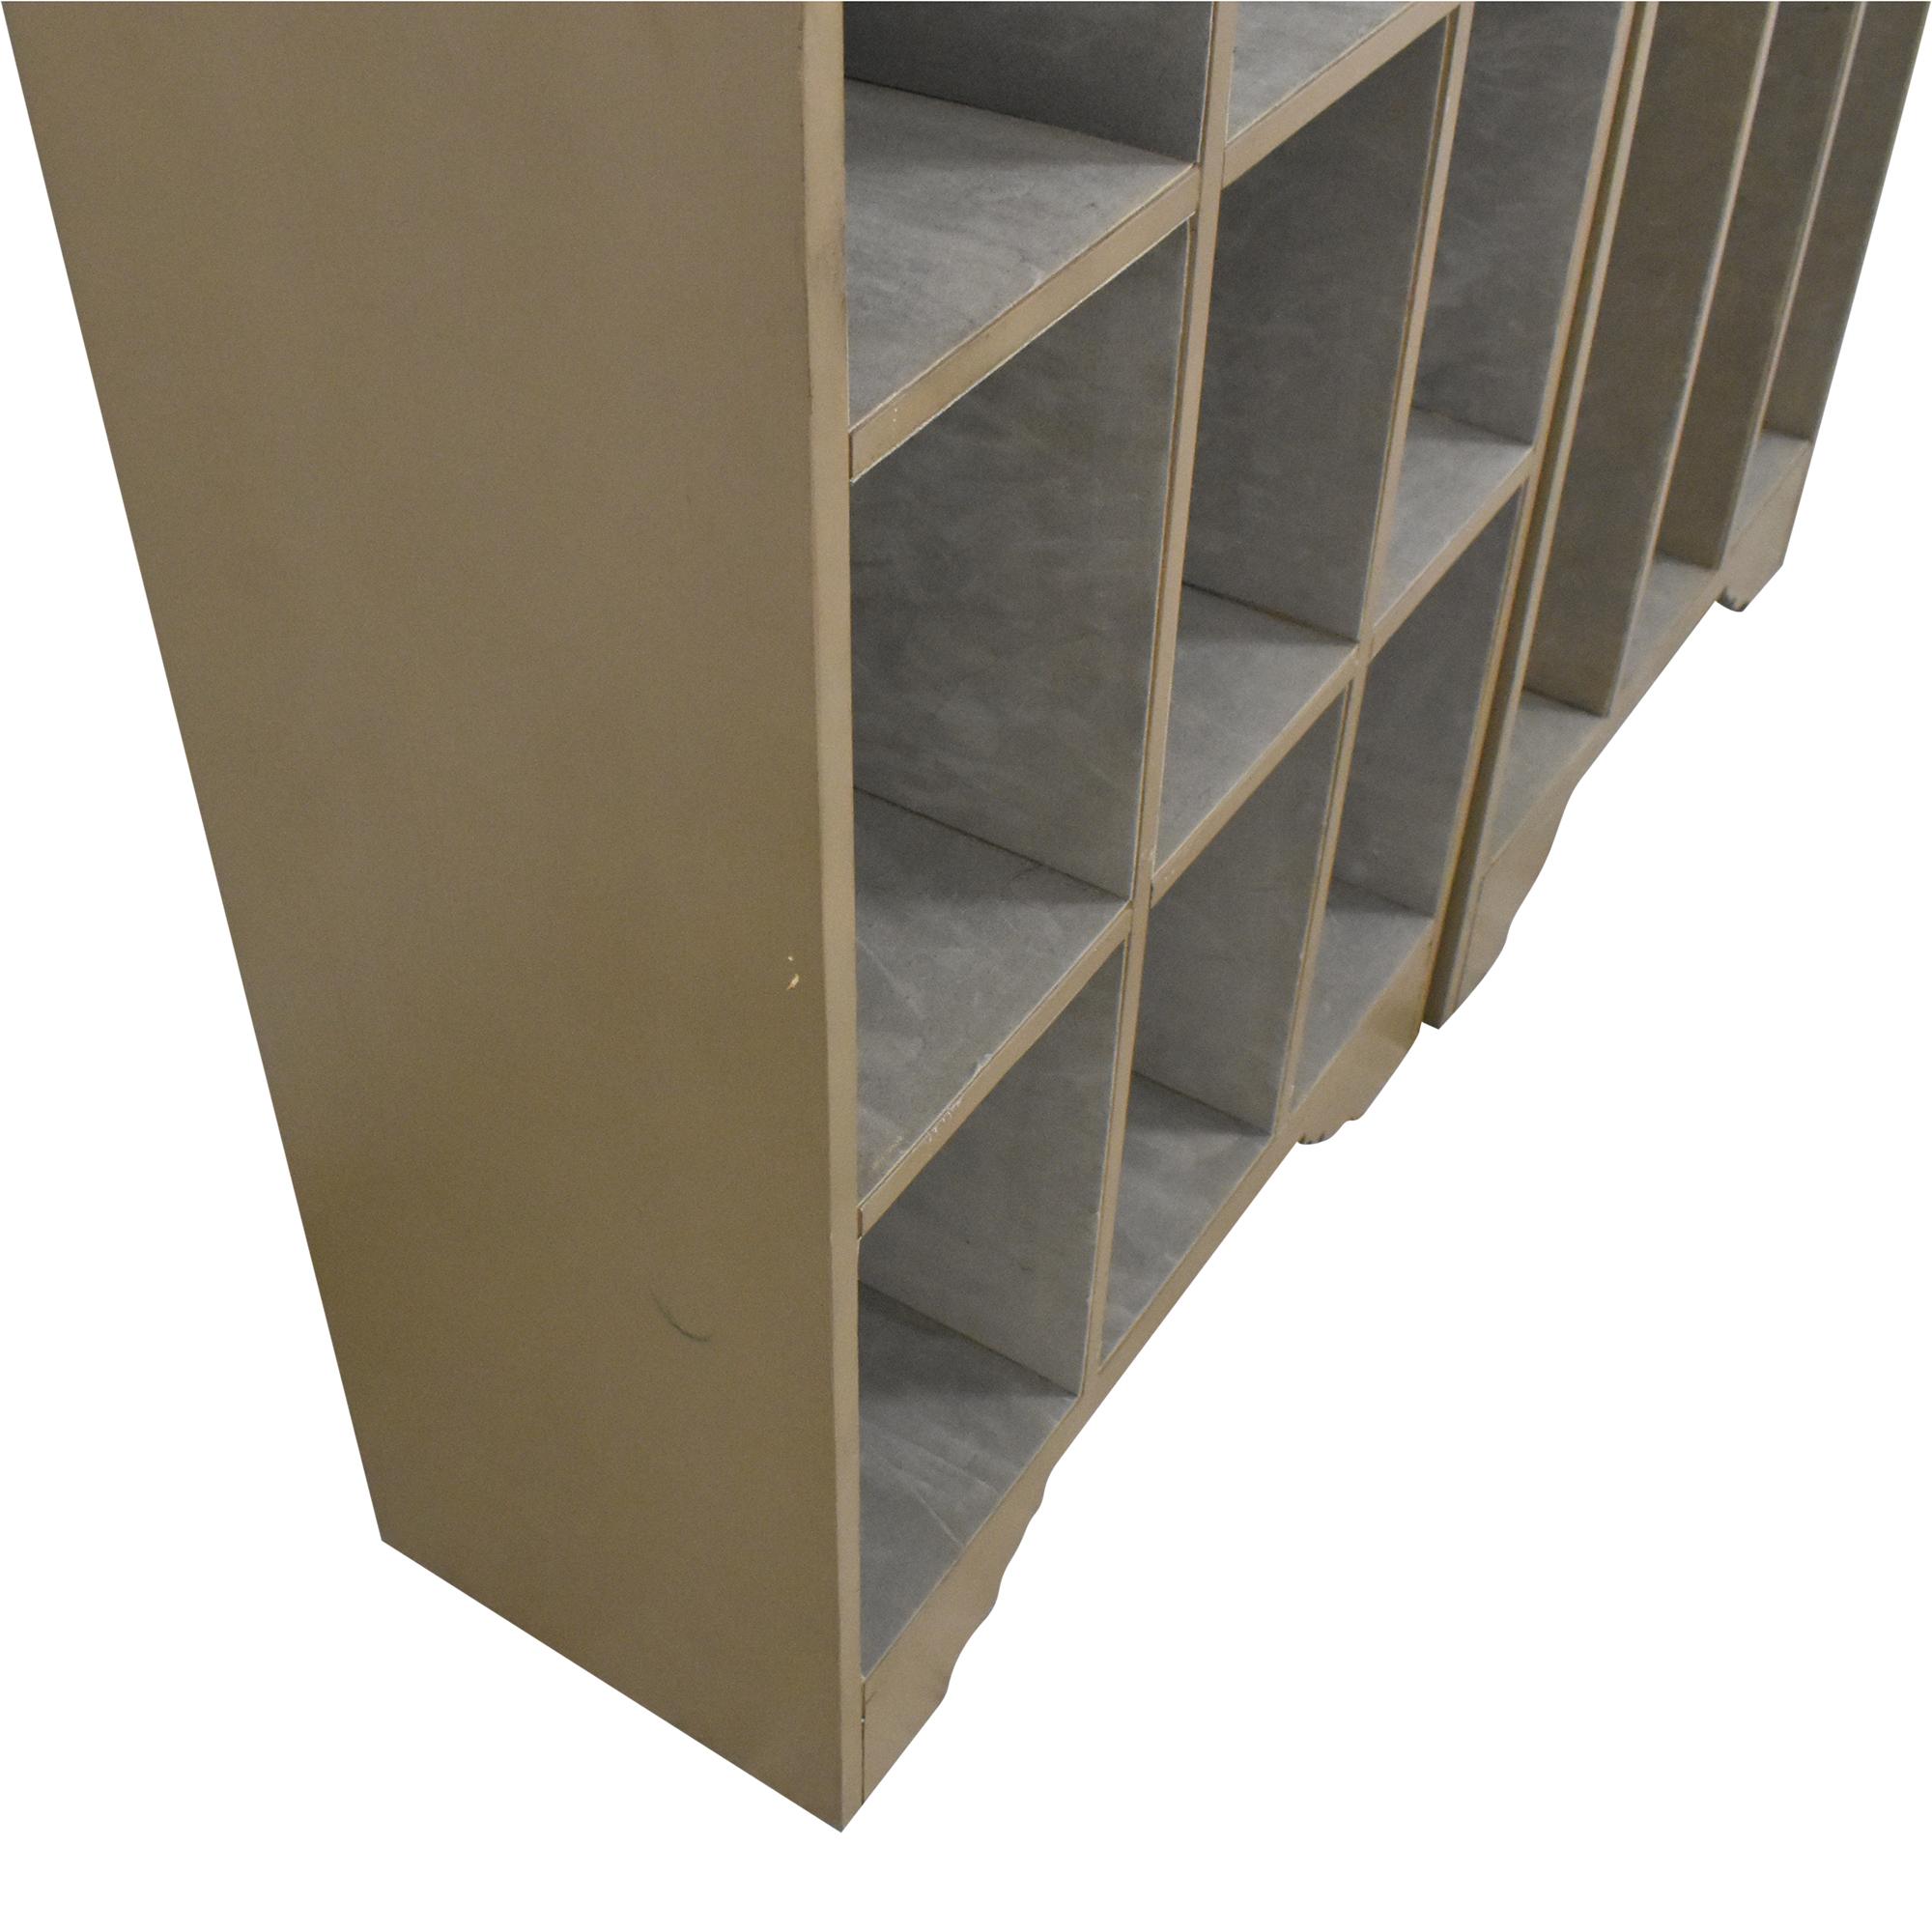 shop Ballard Designs Sarah Storage Towers Ballard Designs Bookcases & Shelving